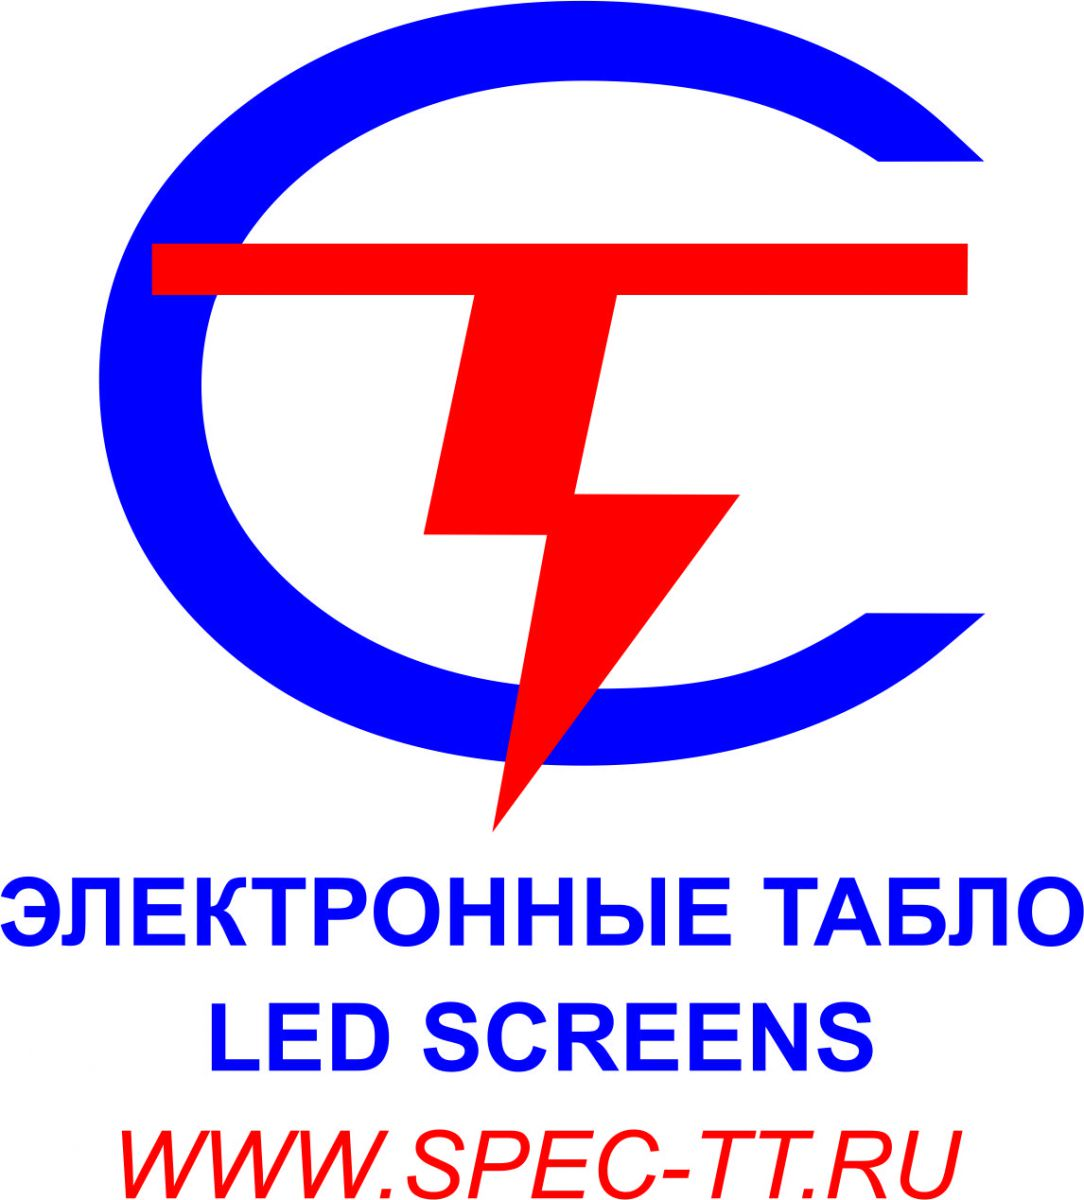 Логотип СпецТранзит